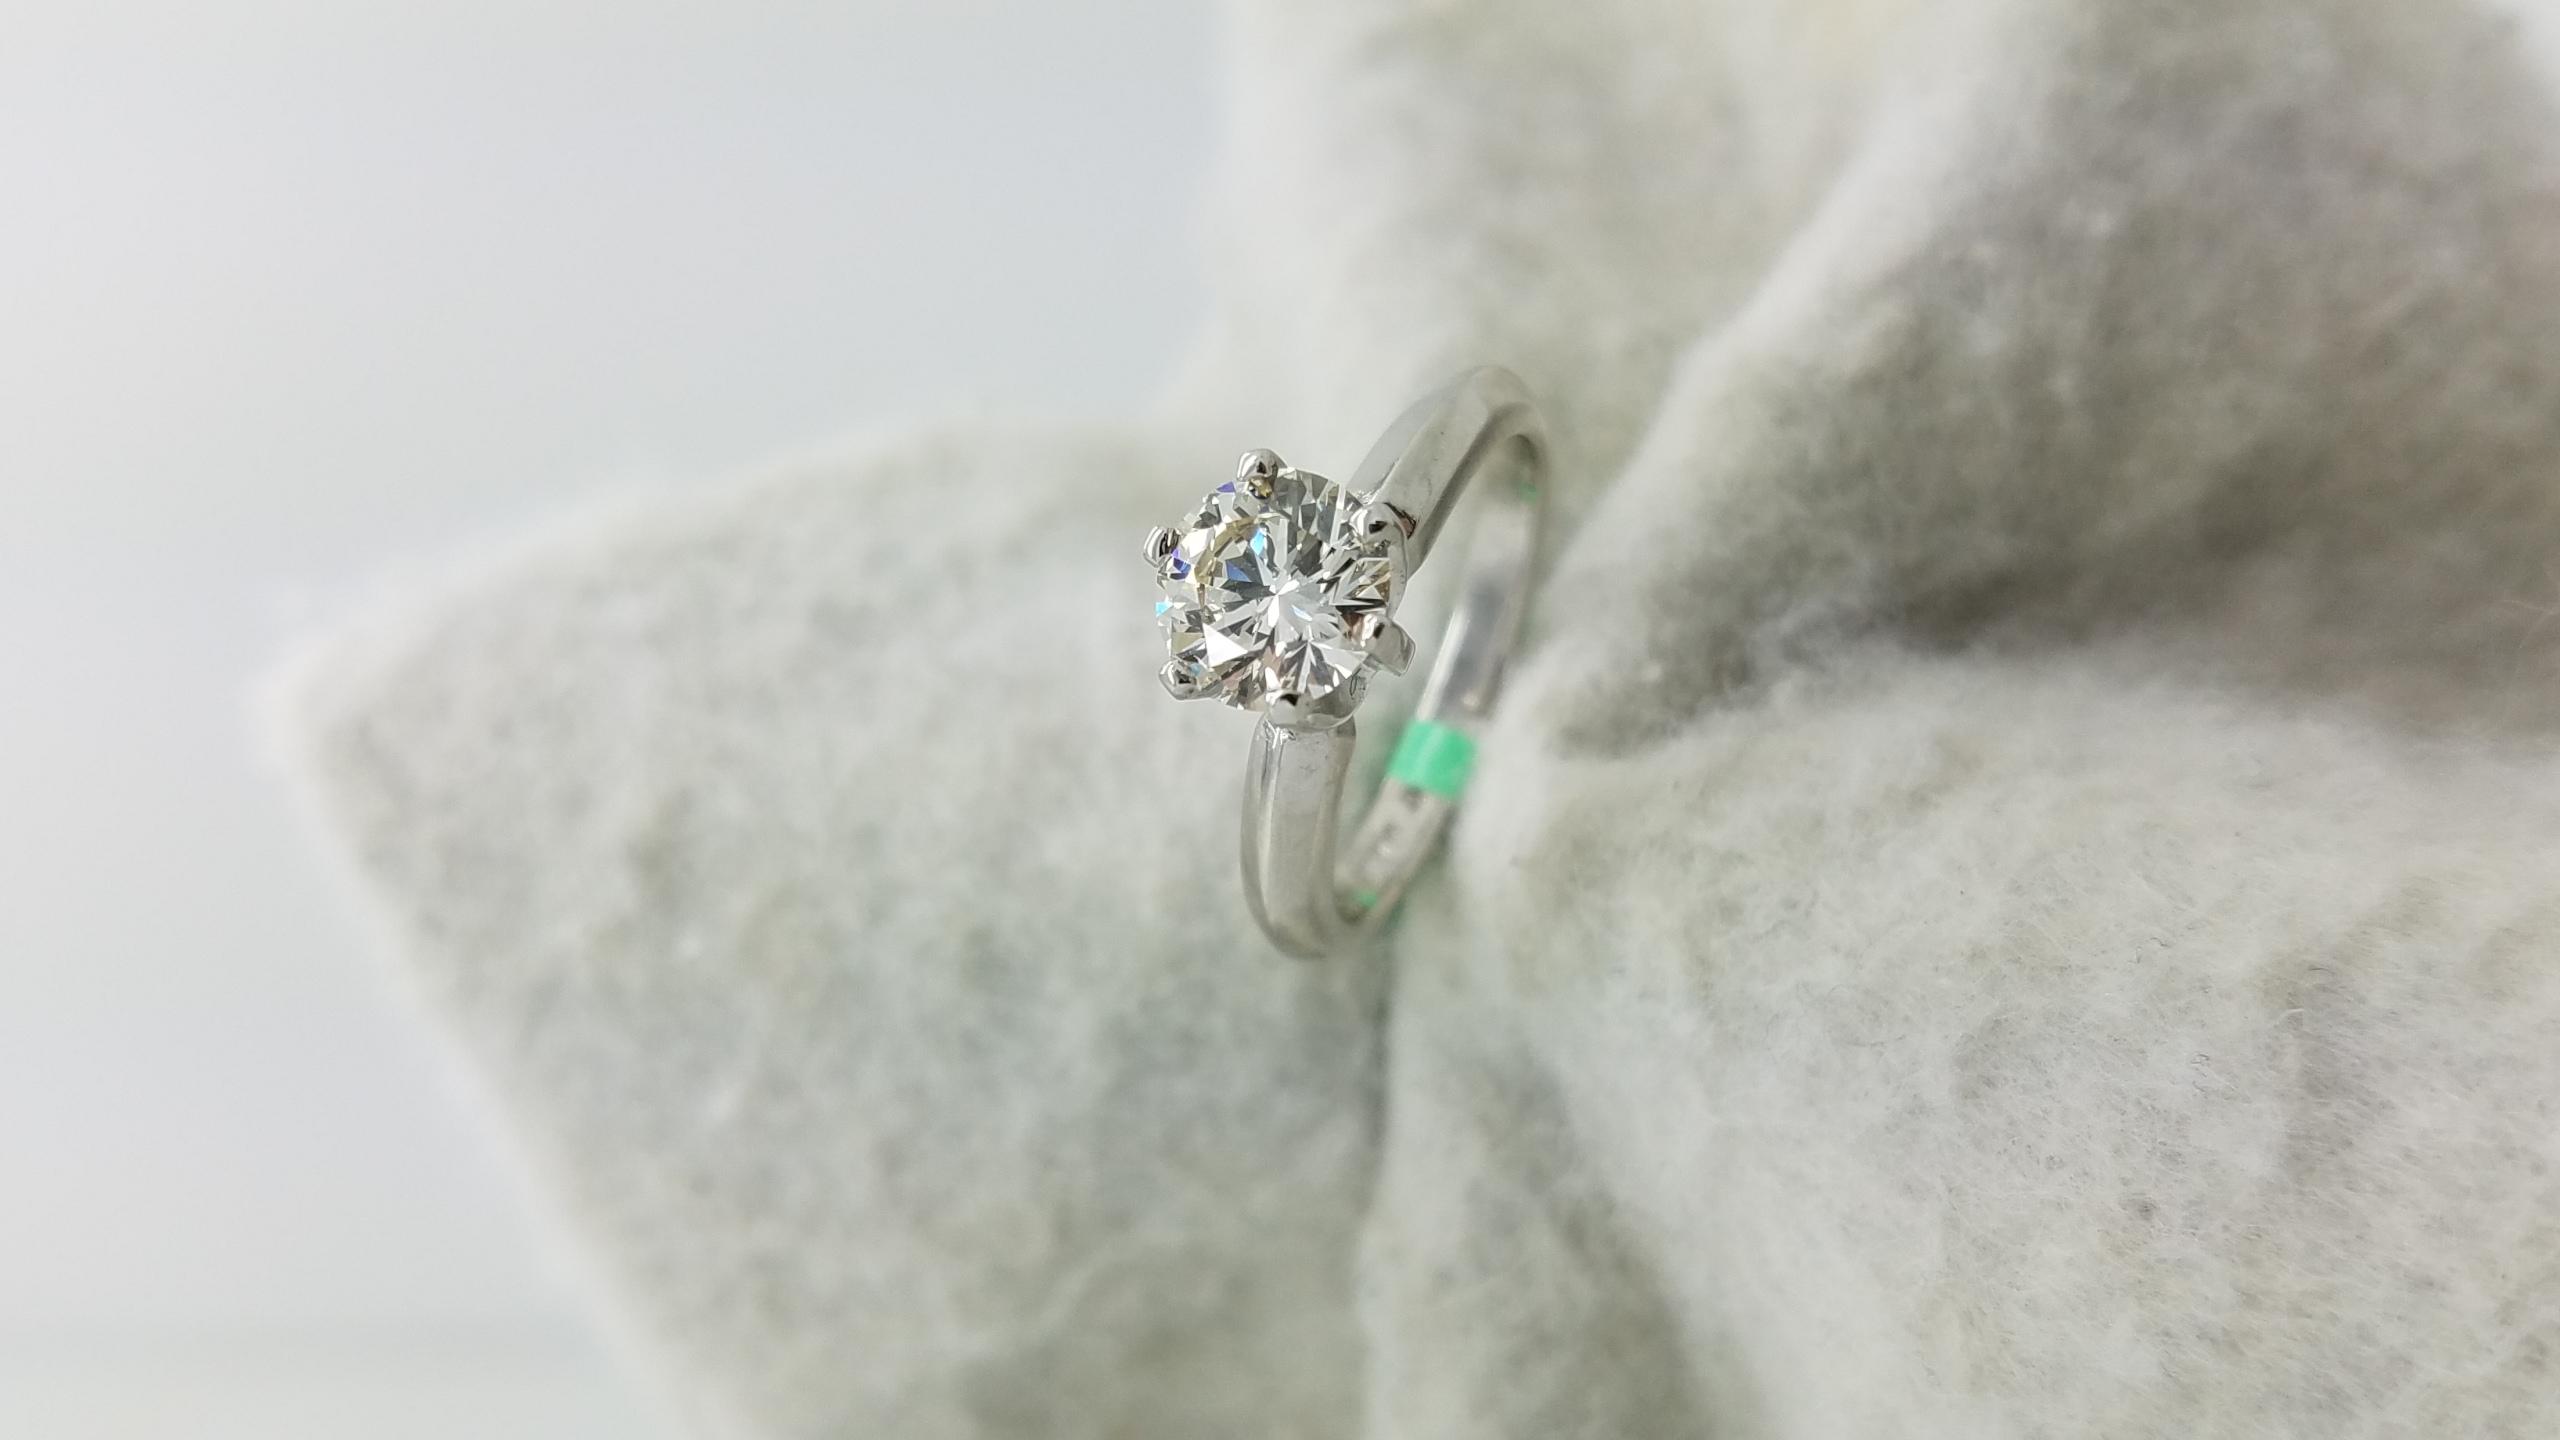 PLWhiteClassic Tiffany Style1.03ct.RoundCutDiamondLVVS16-prongSolitaireEngagement-Ring